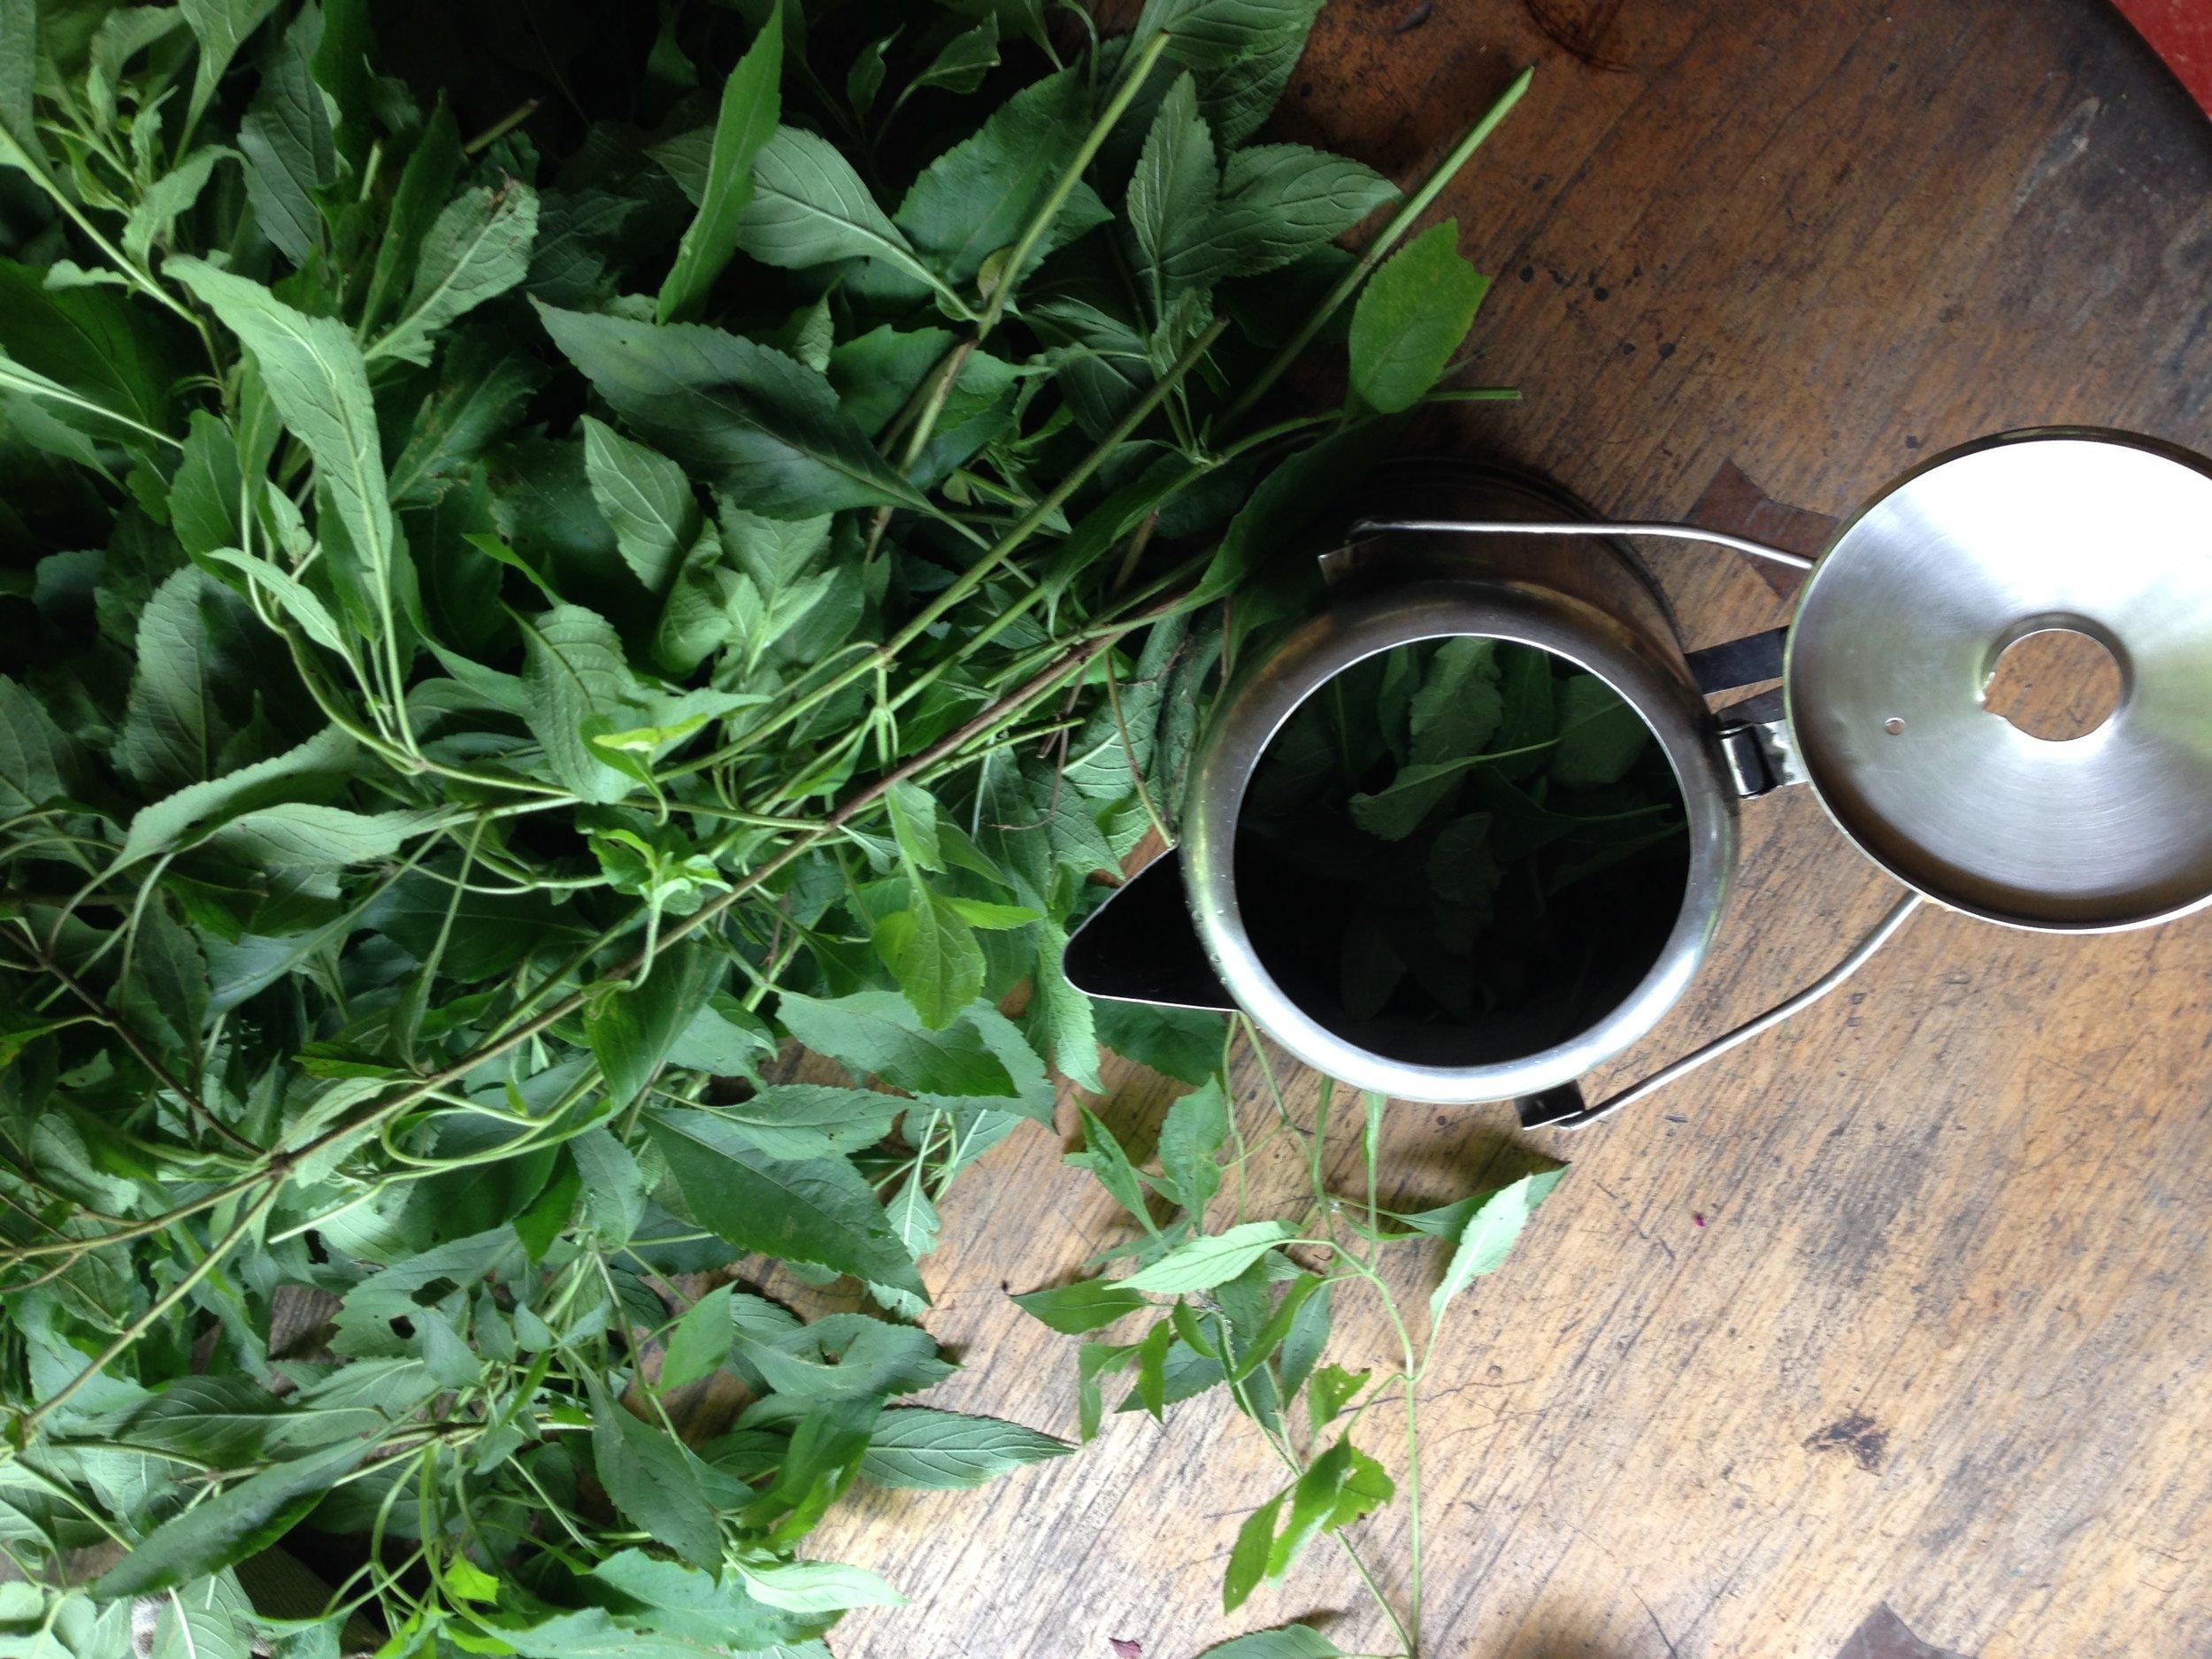 Tulsi or Sacred Basil harvested for tea.